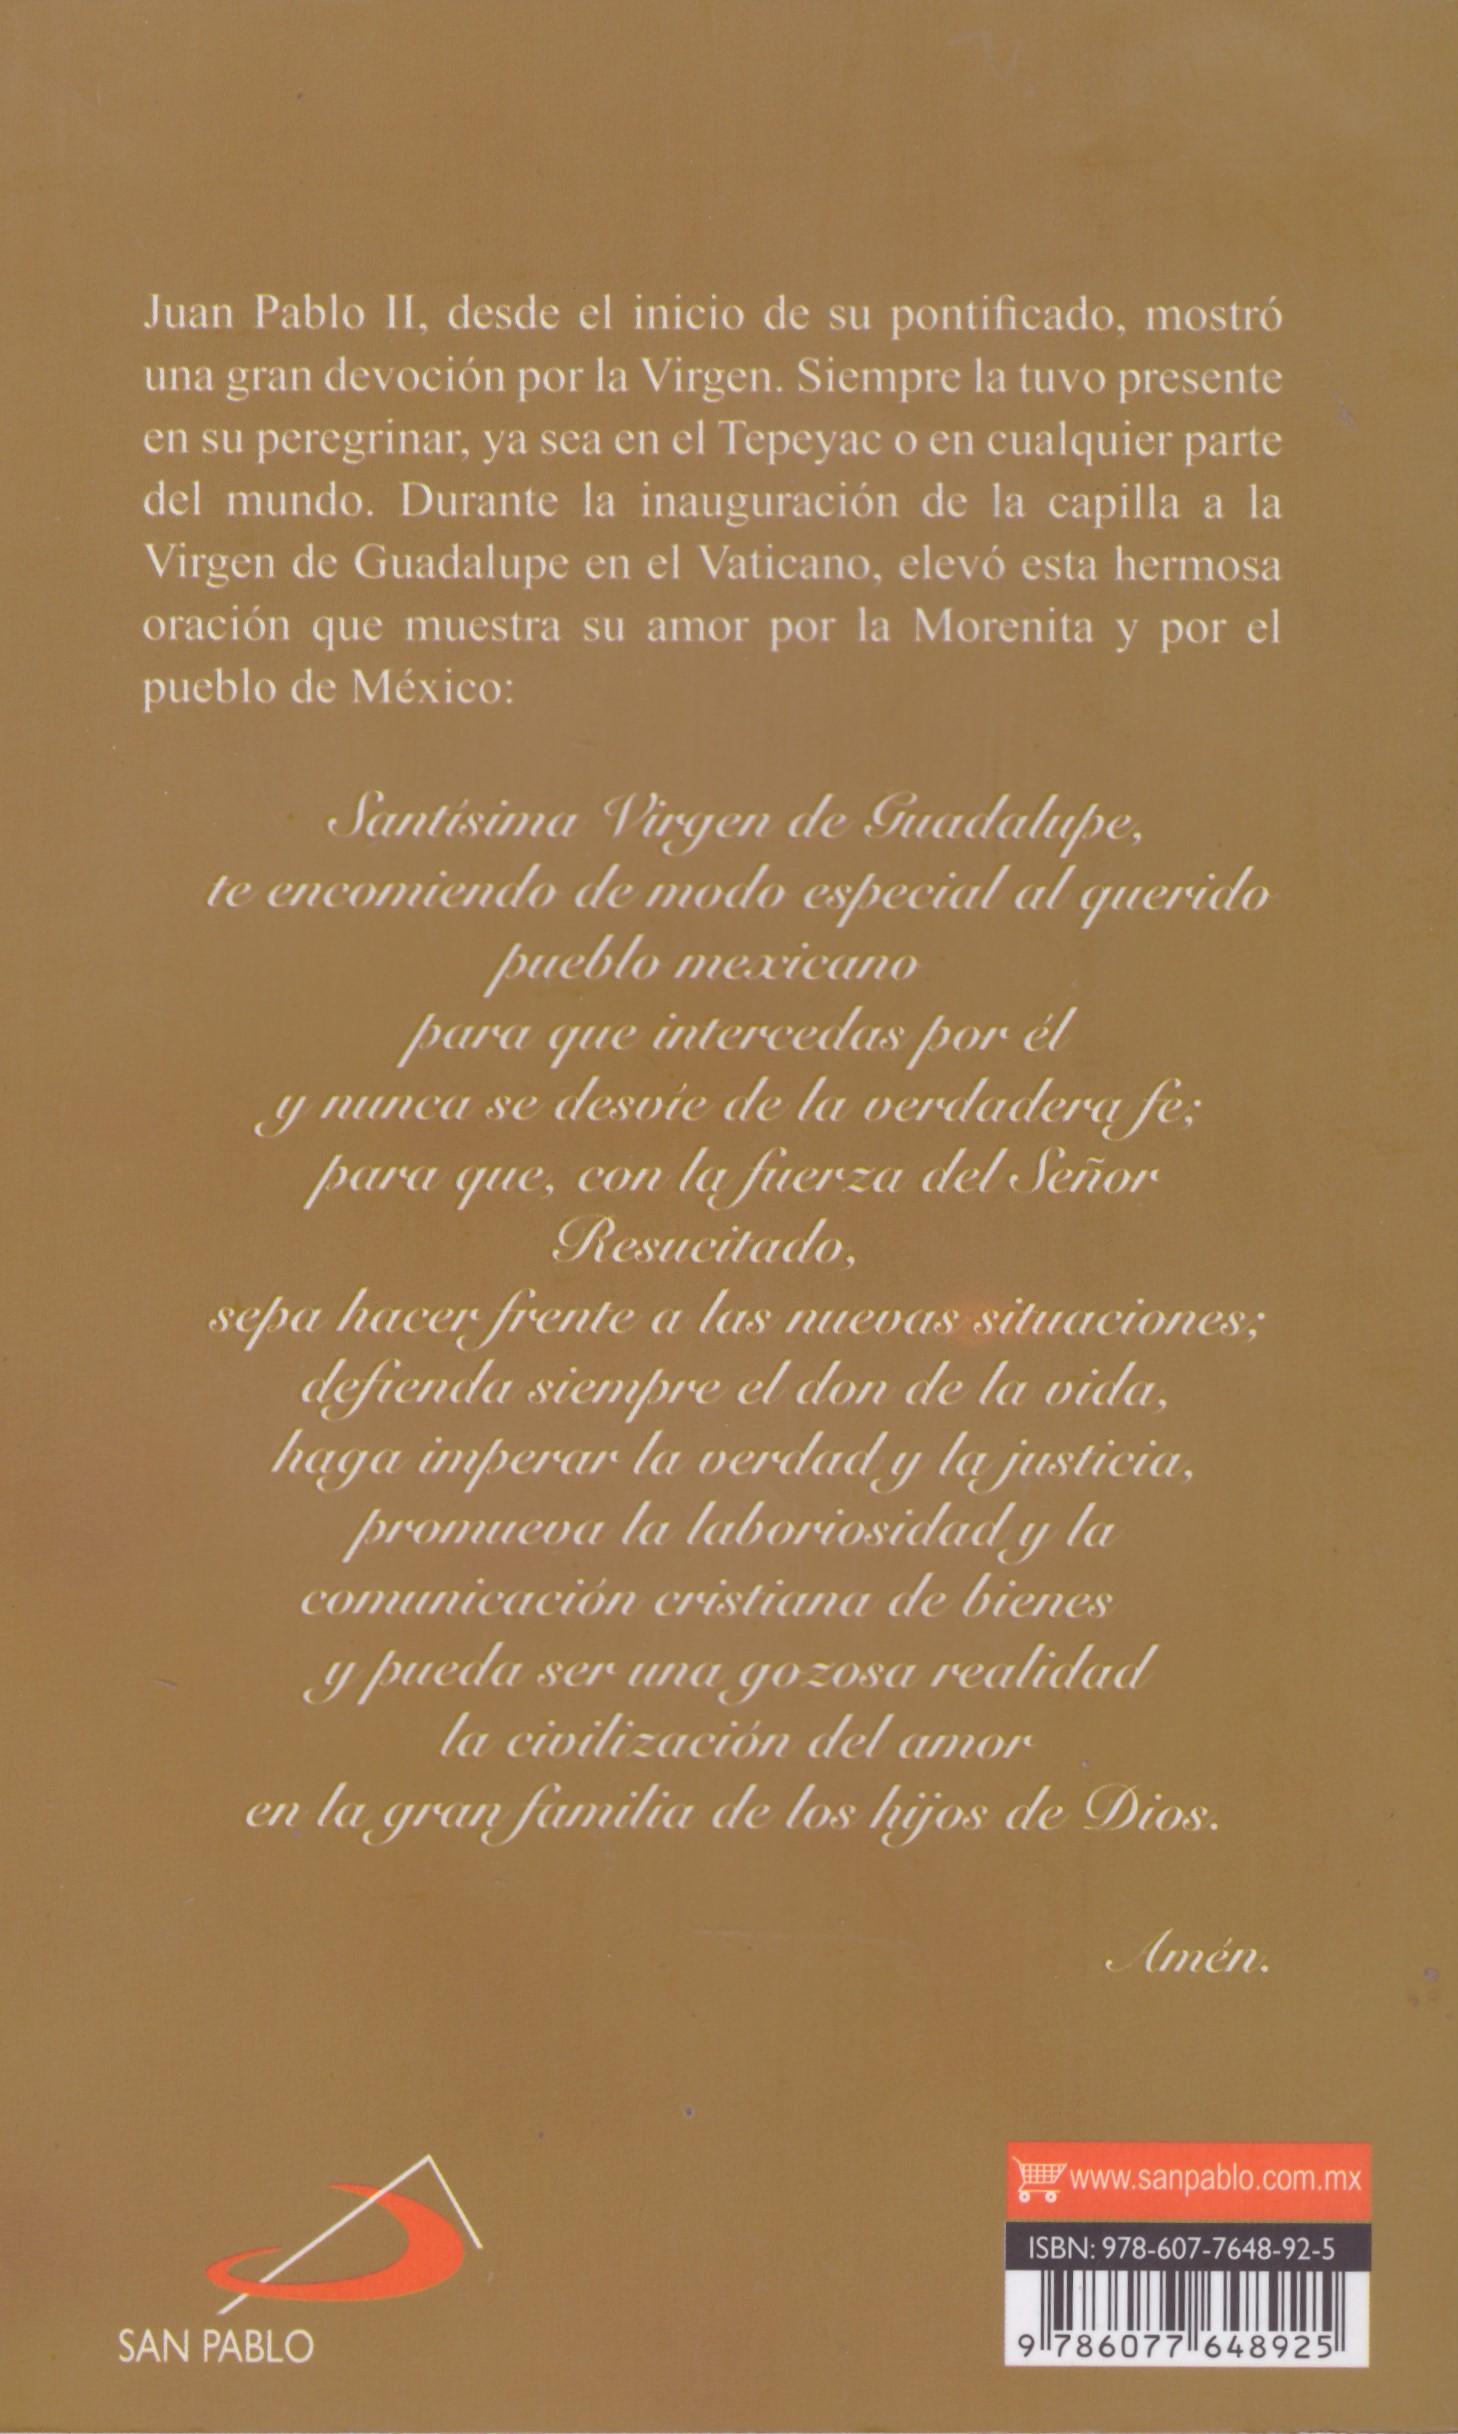 Juan Pablo II. El Papa guadalupano